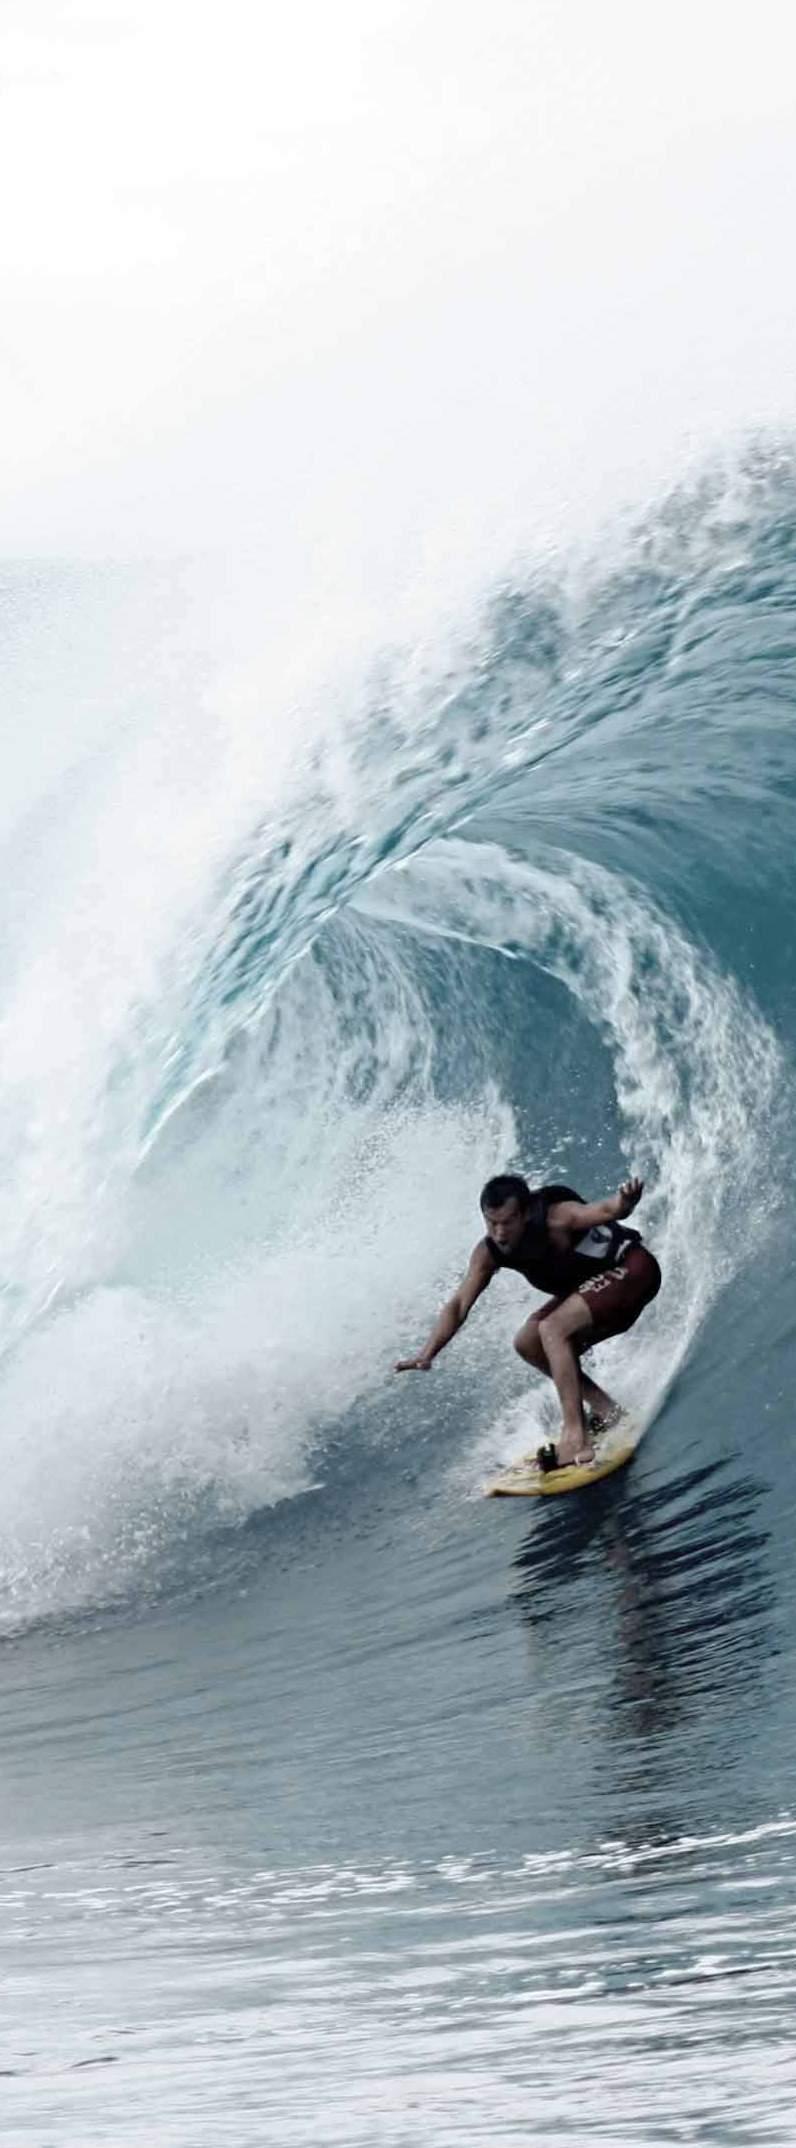 surf-wave-narrow